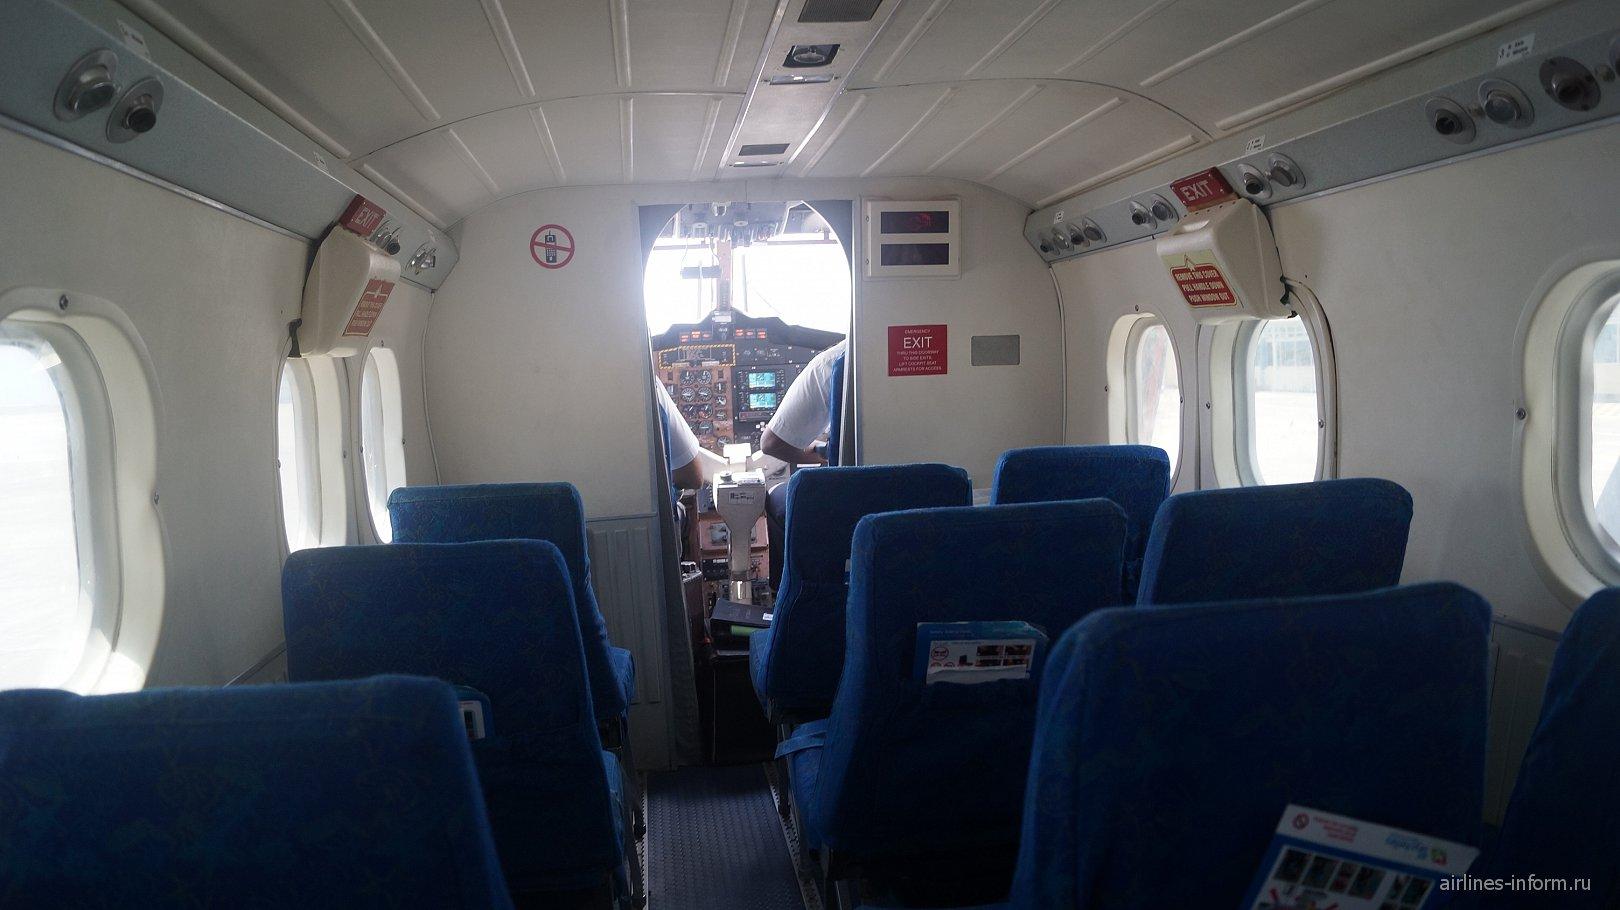 Салон самолета DHC-6 Twin Otter авиакомпании Air Seychelles